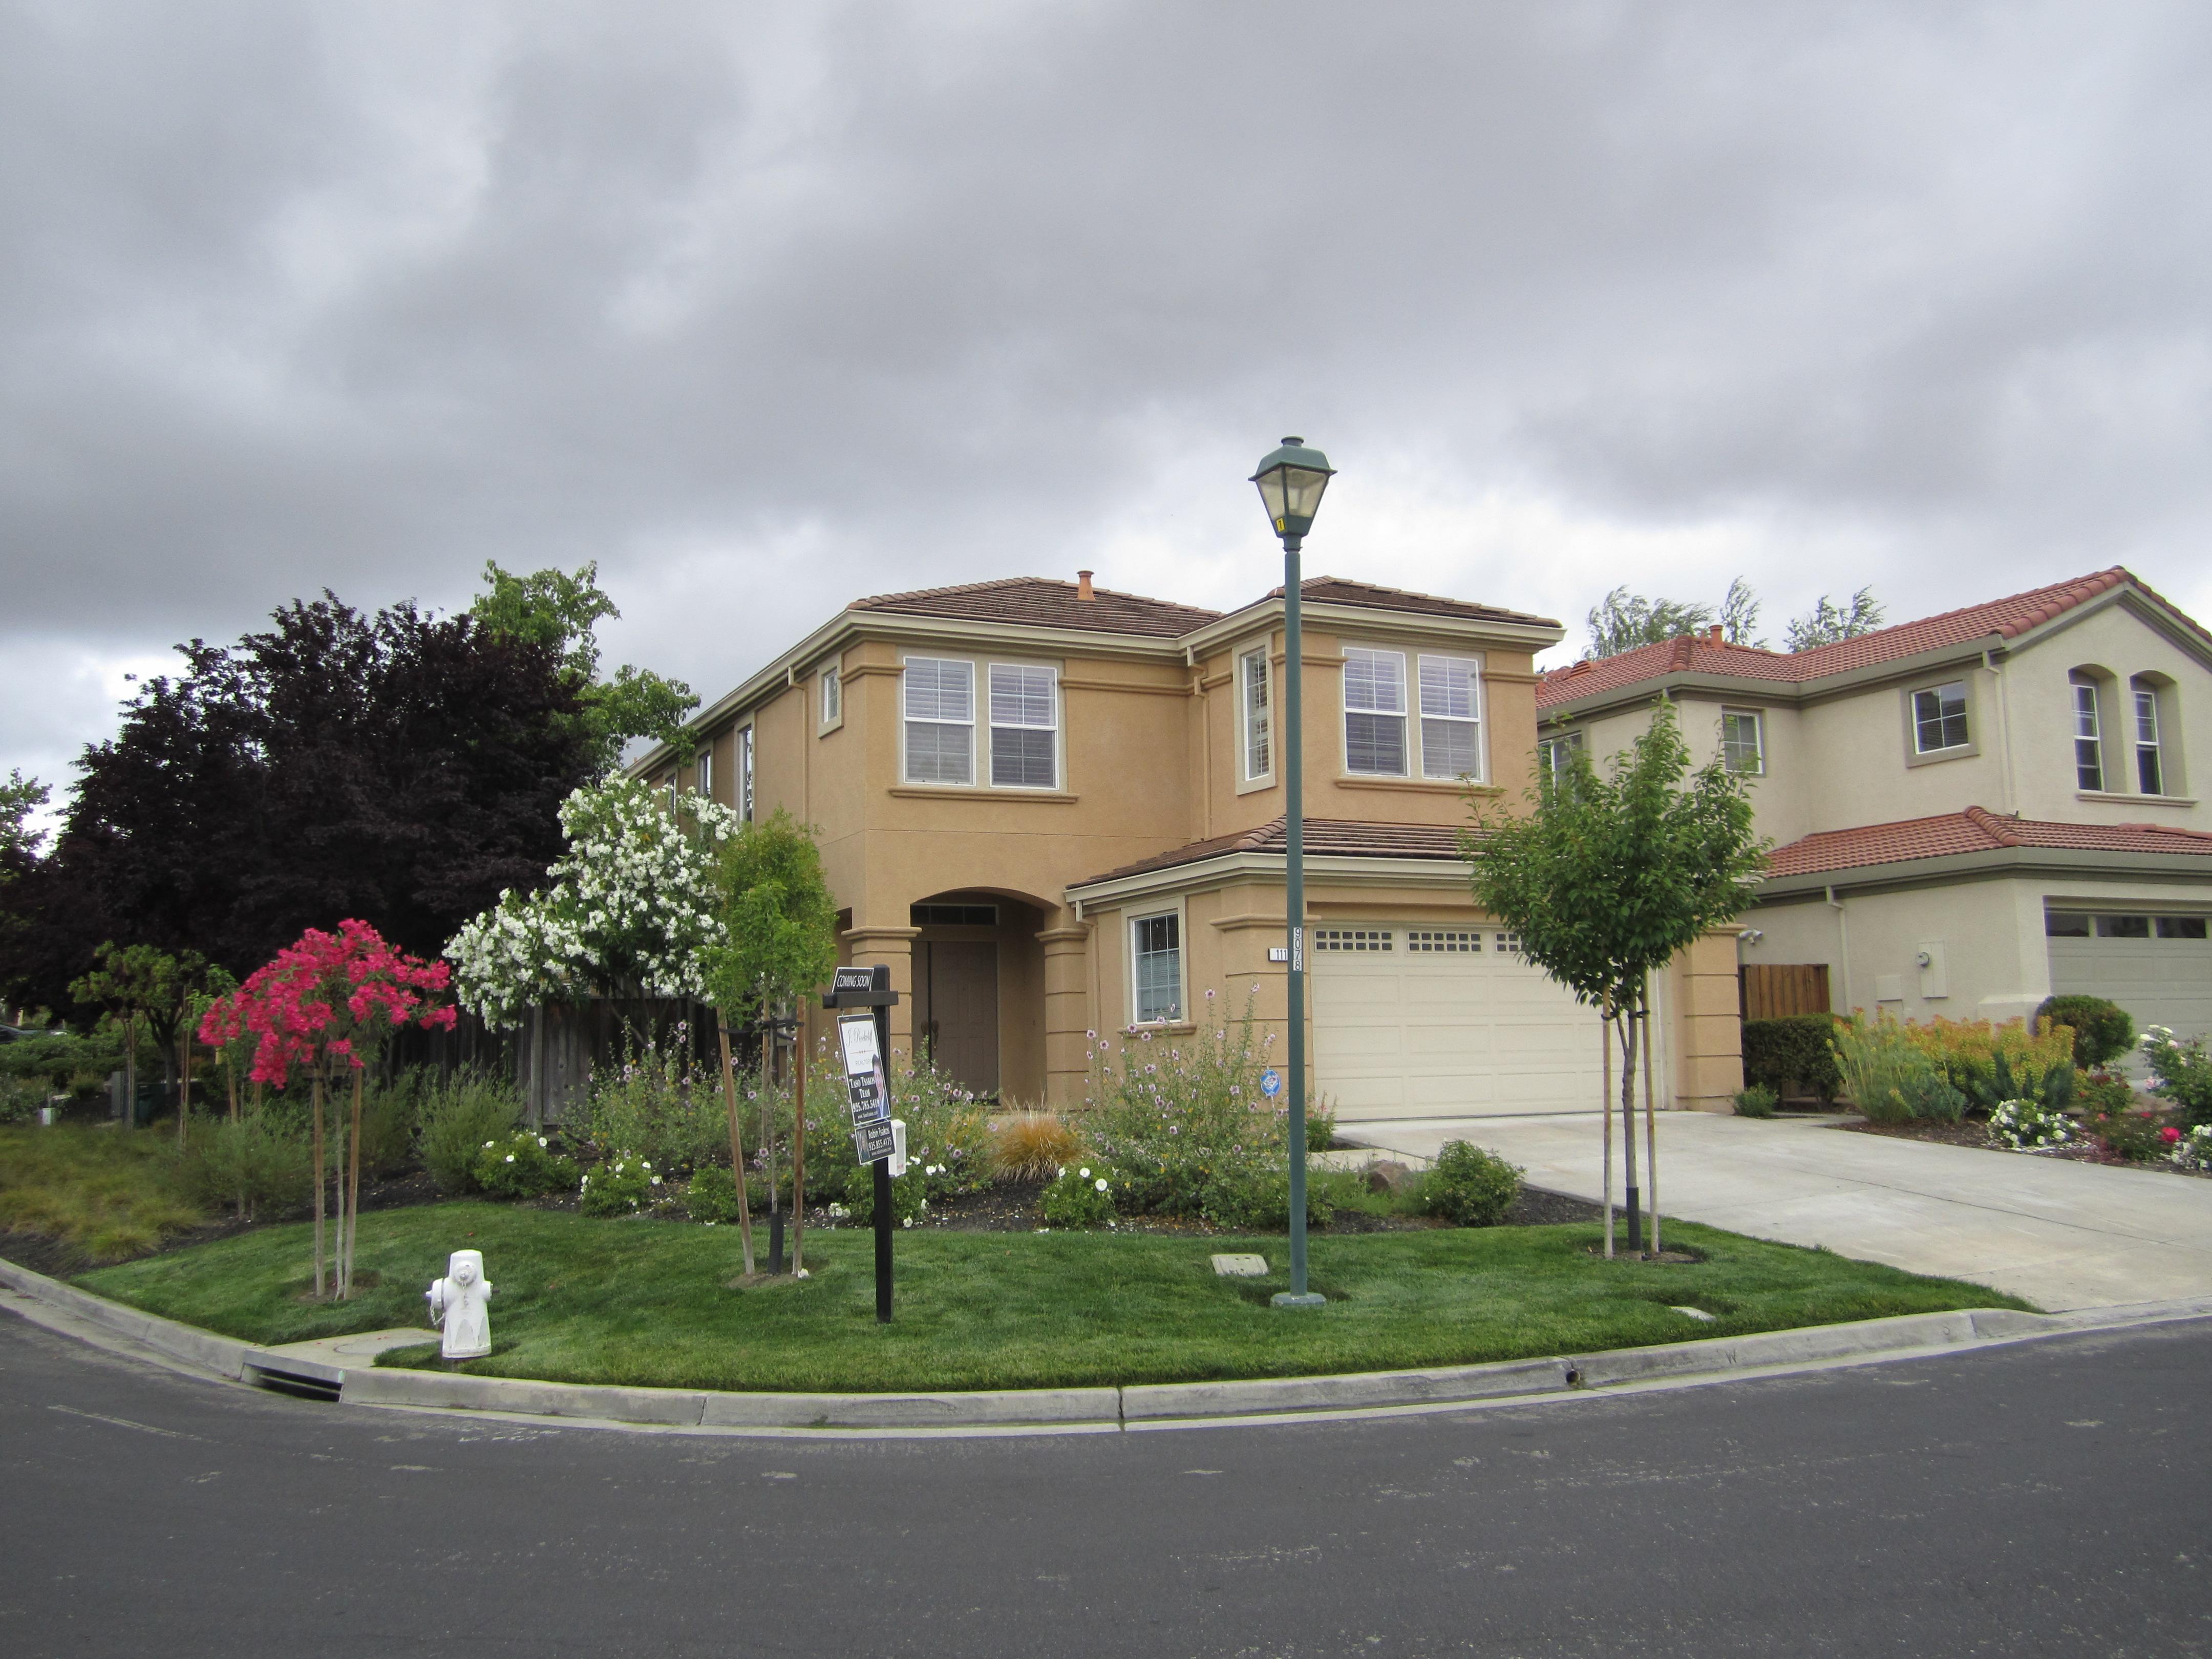 111 Pearlgrass Ct., San Ramon for Sale